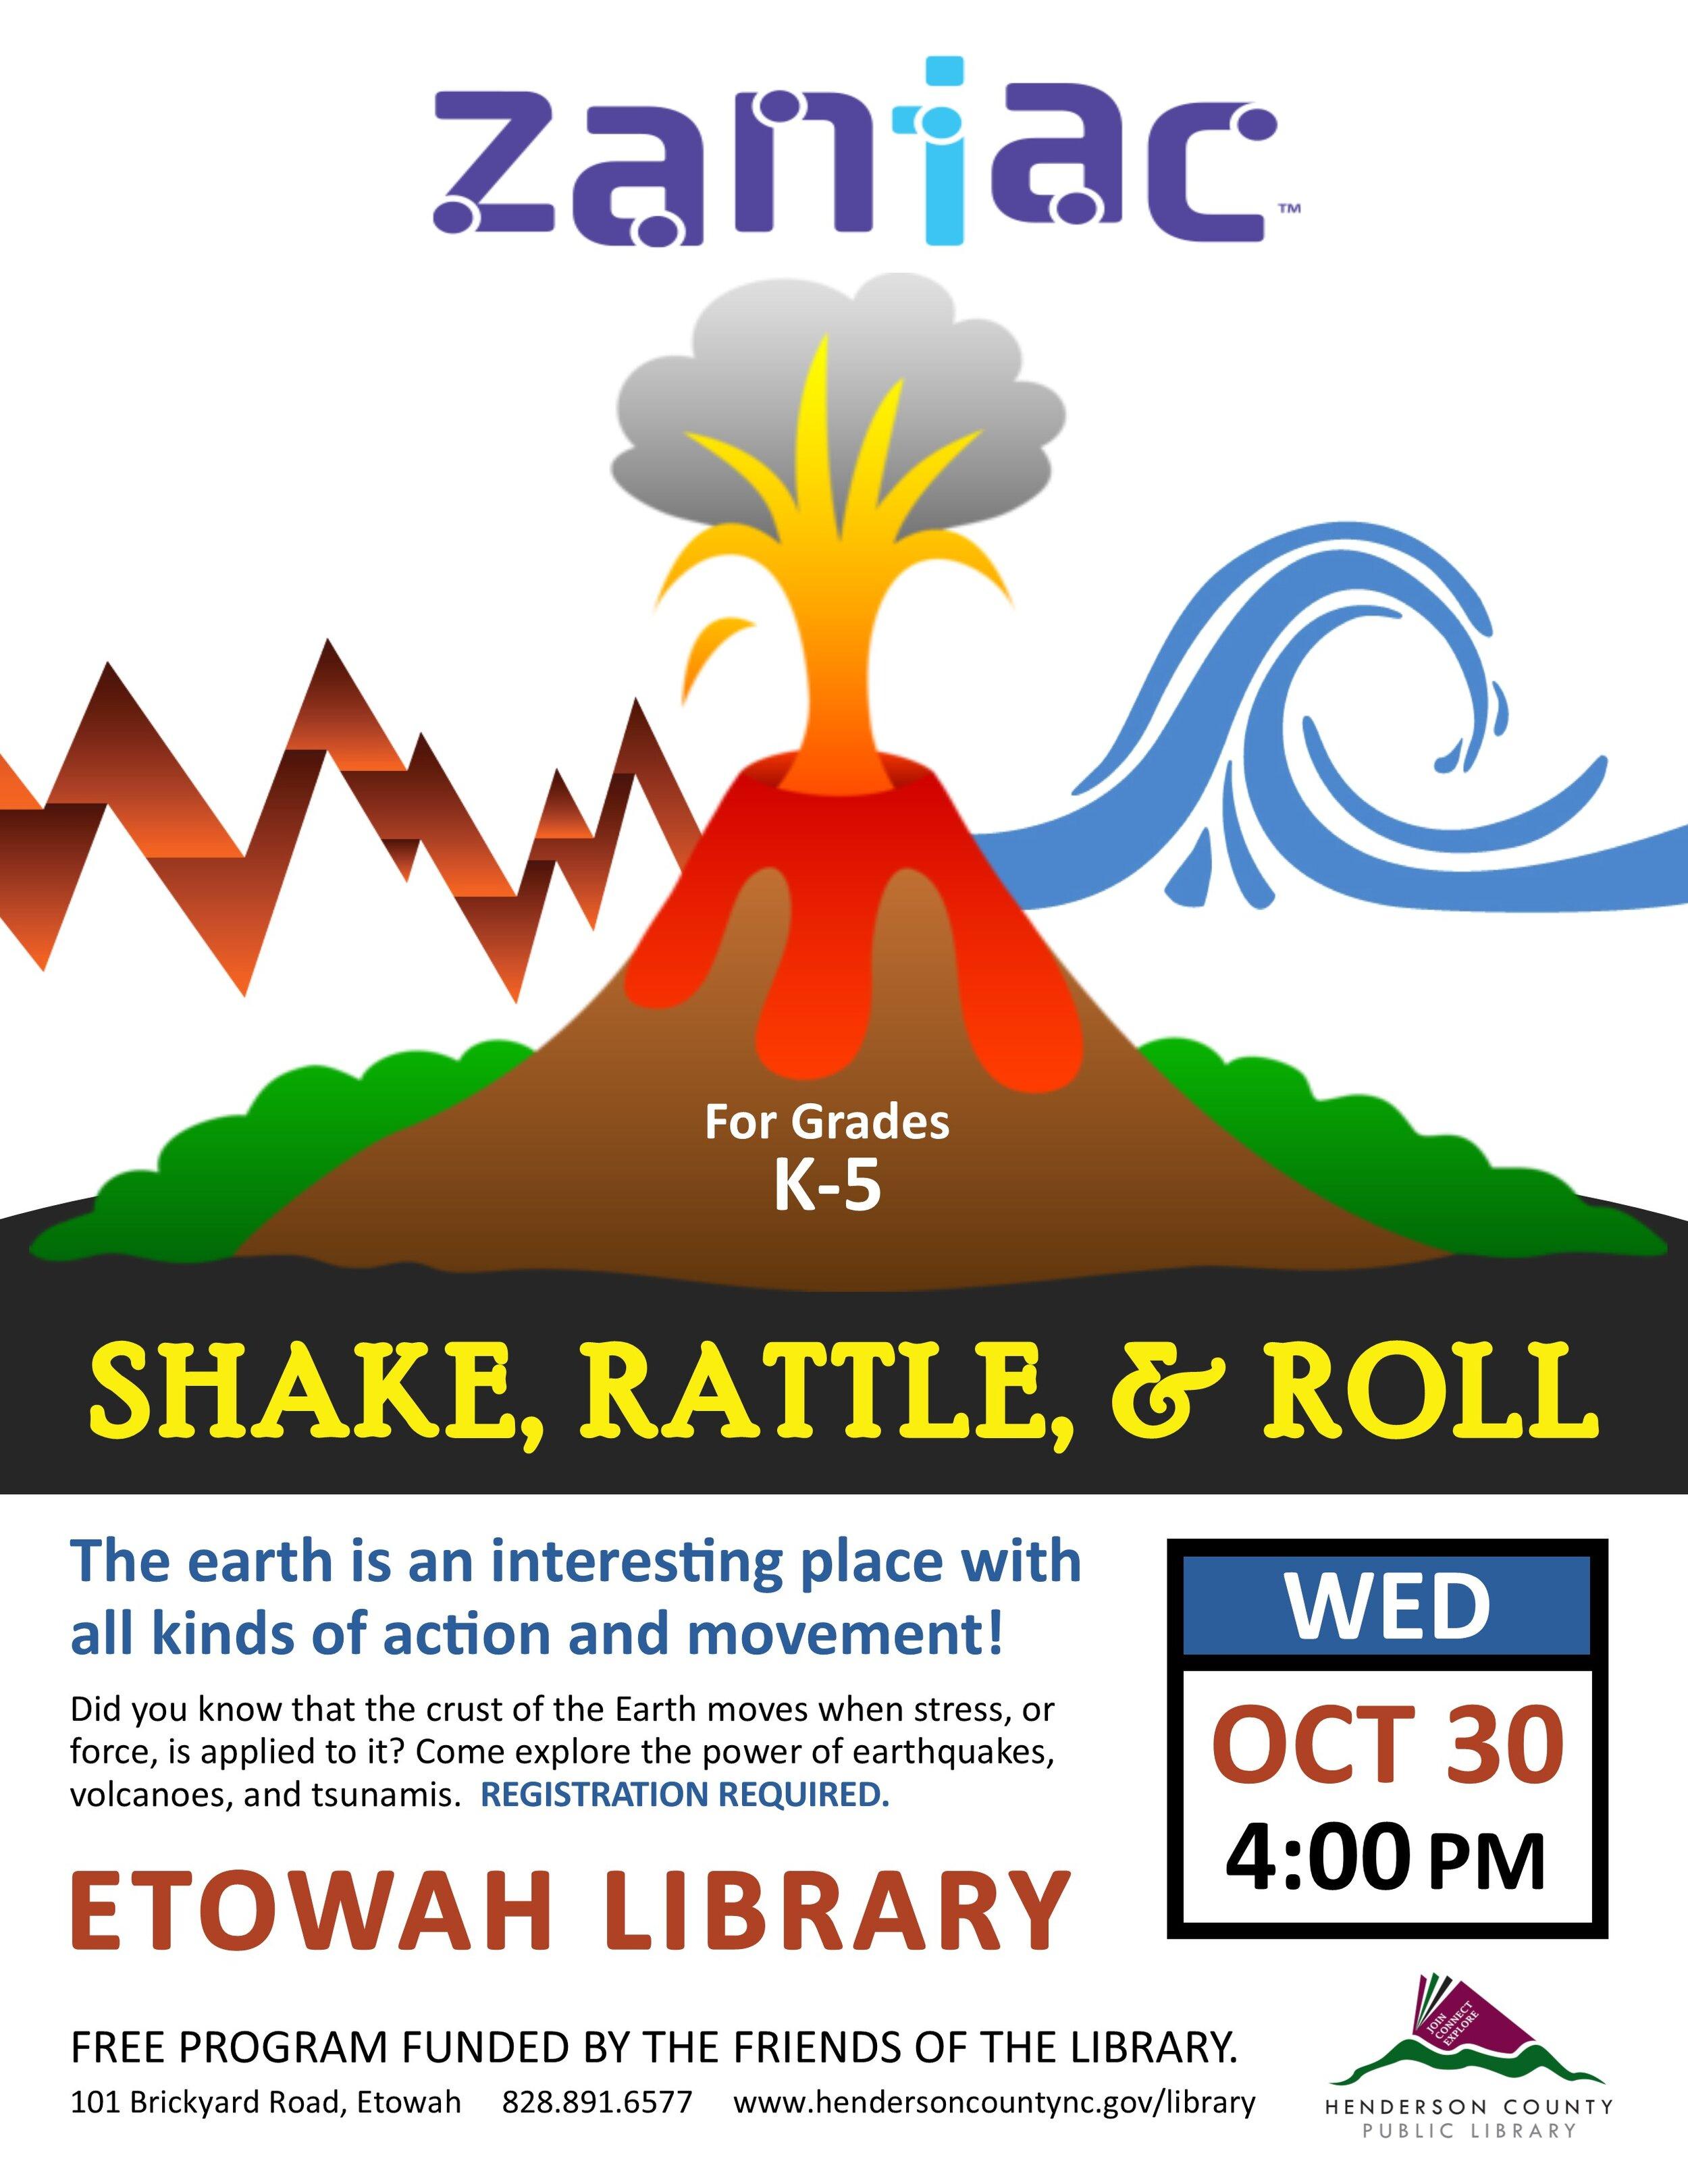 ET- Zaniac Shake Rattle and Roll.jpg